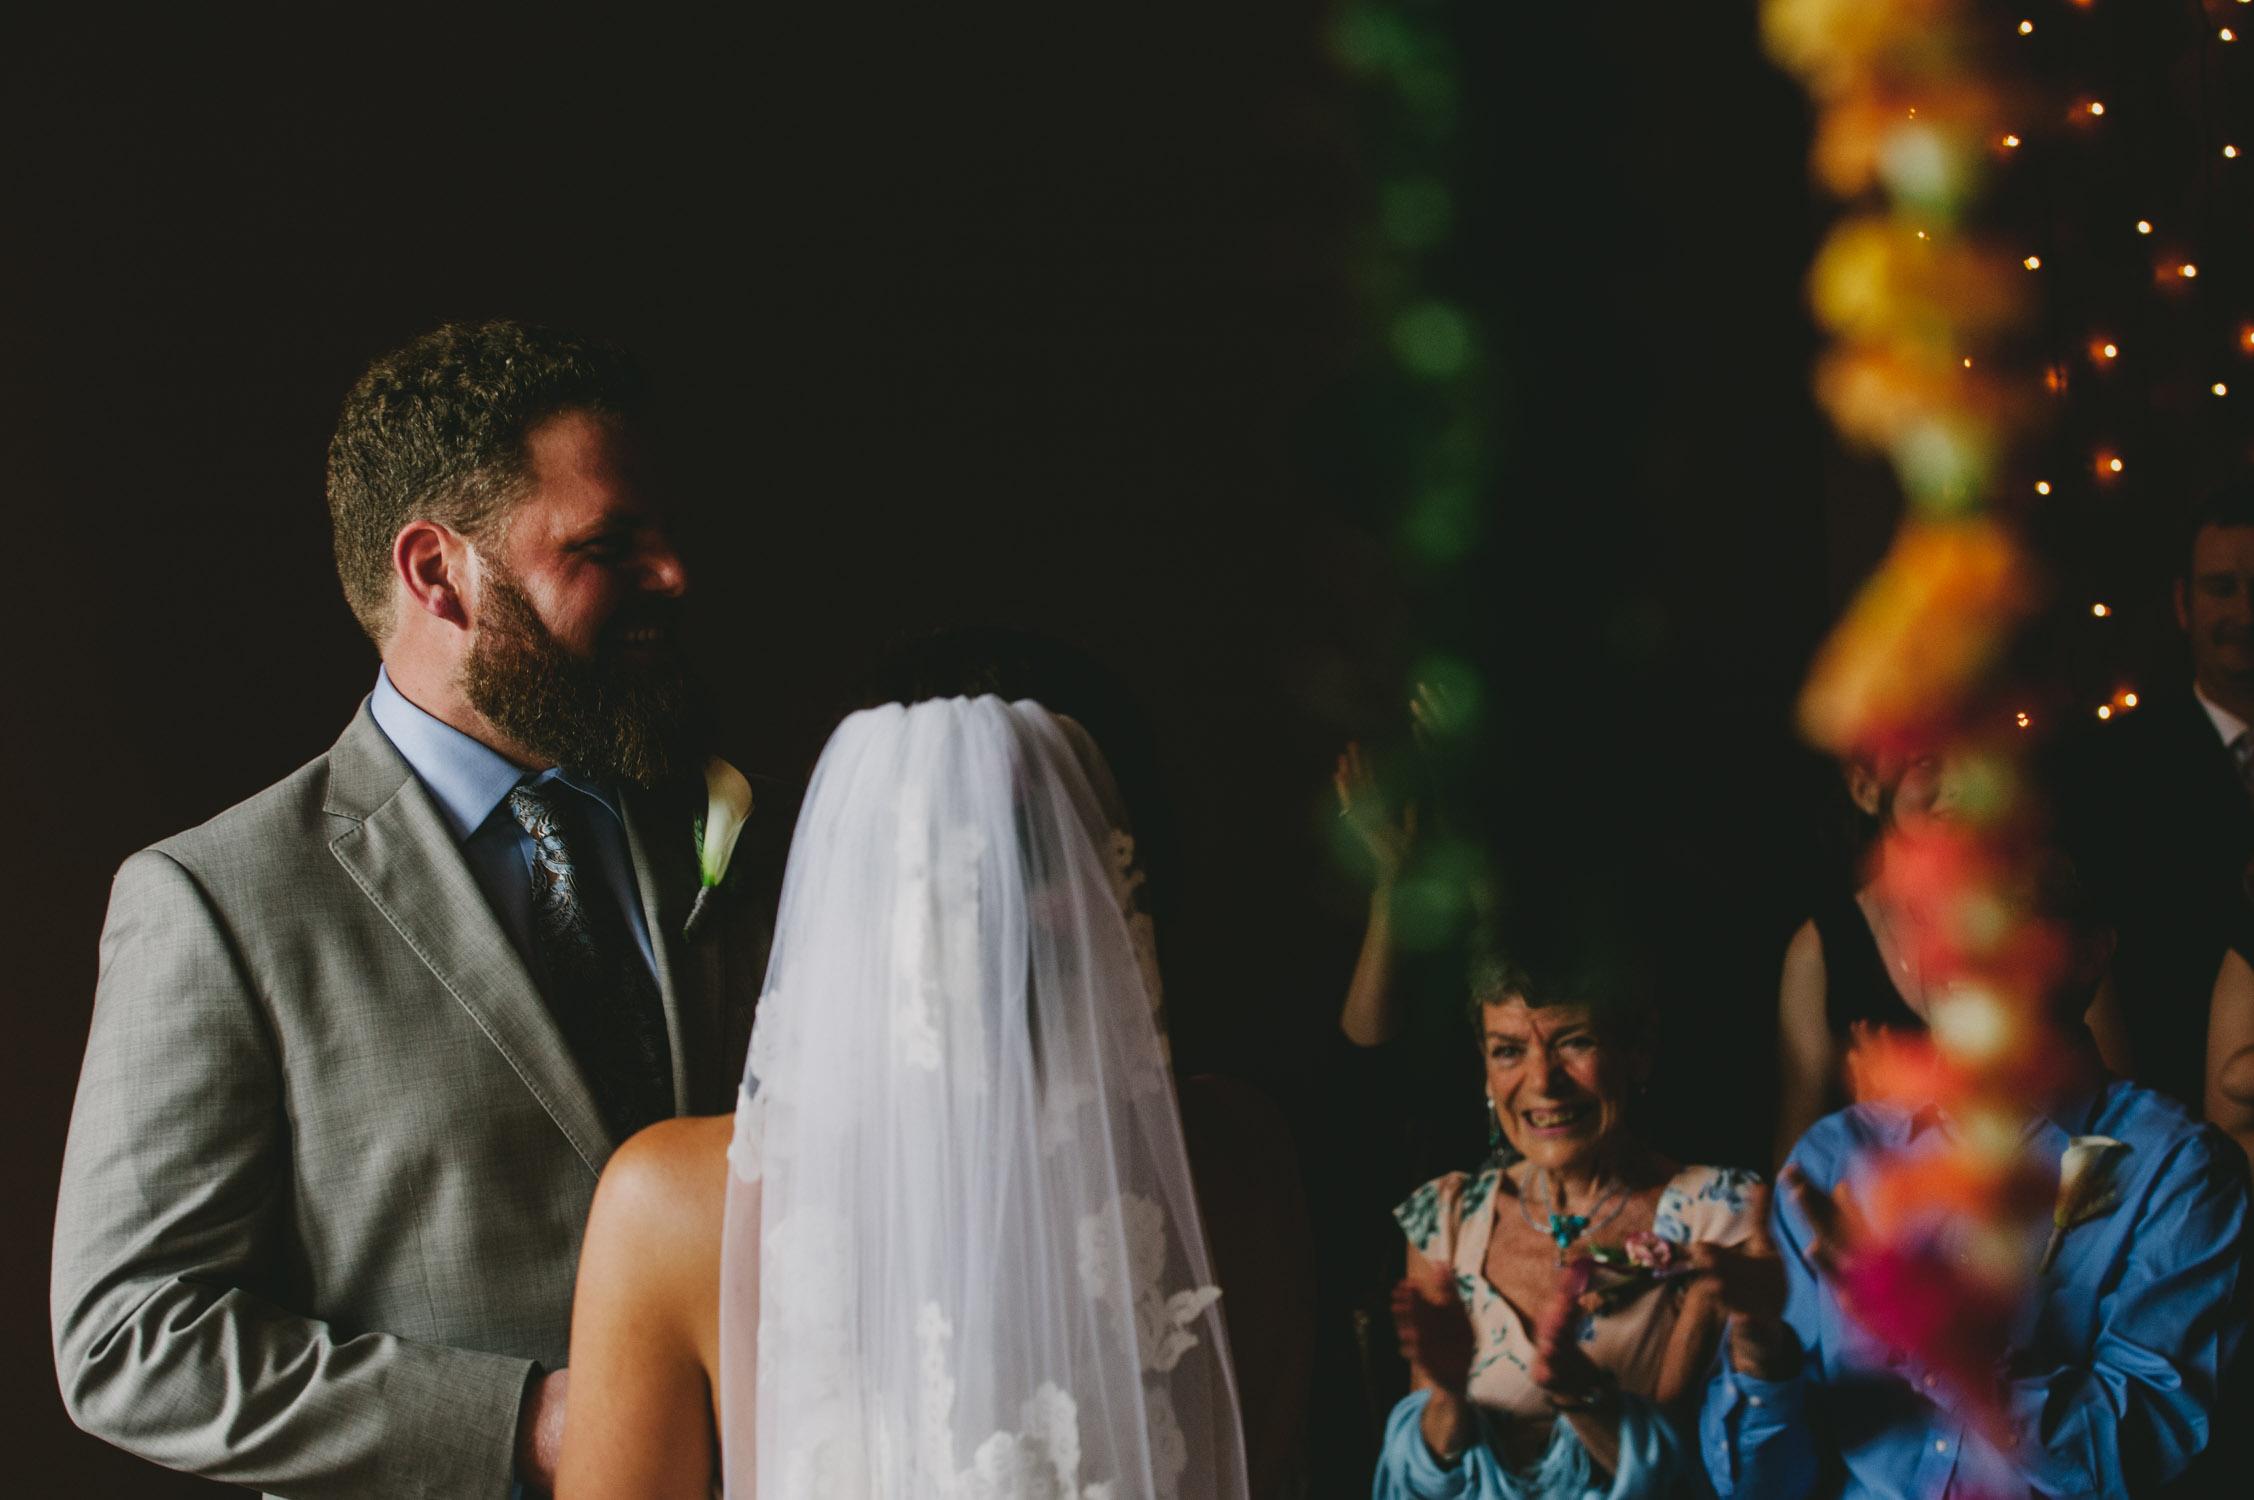 chapel hill wedding ceremony photo